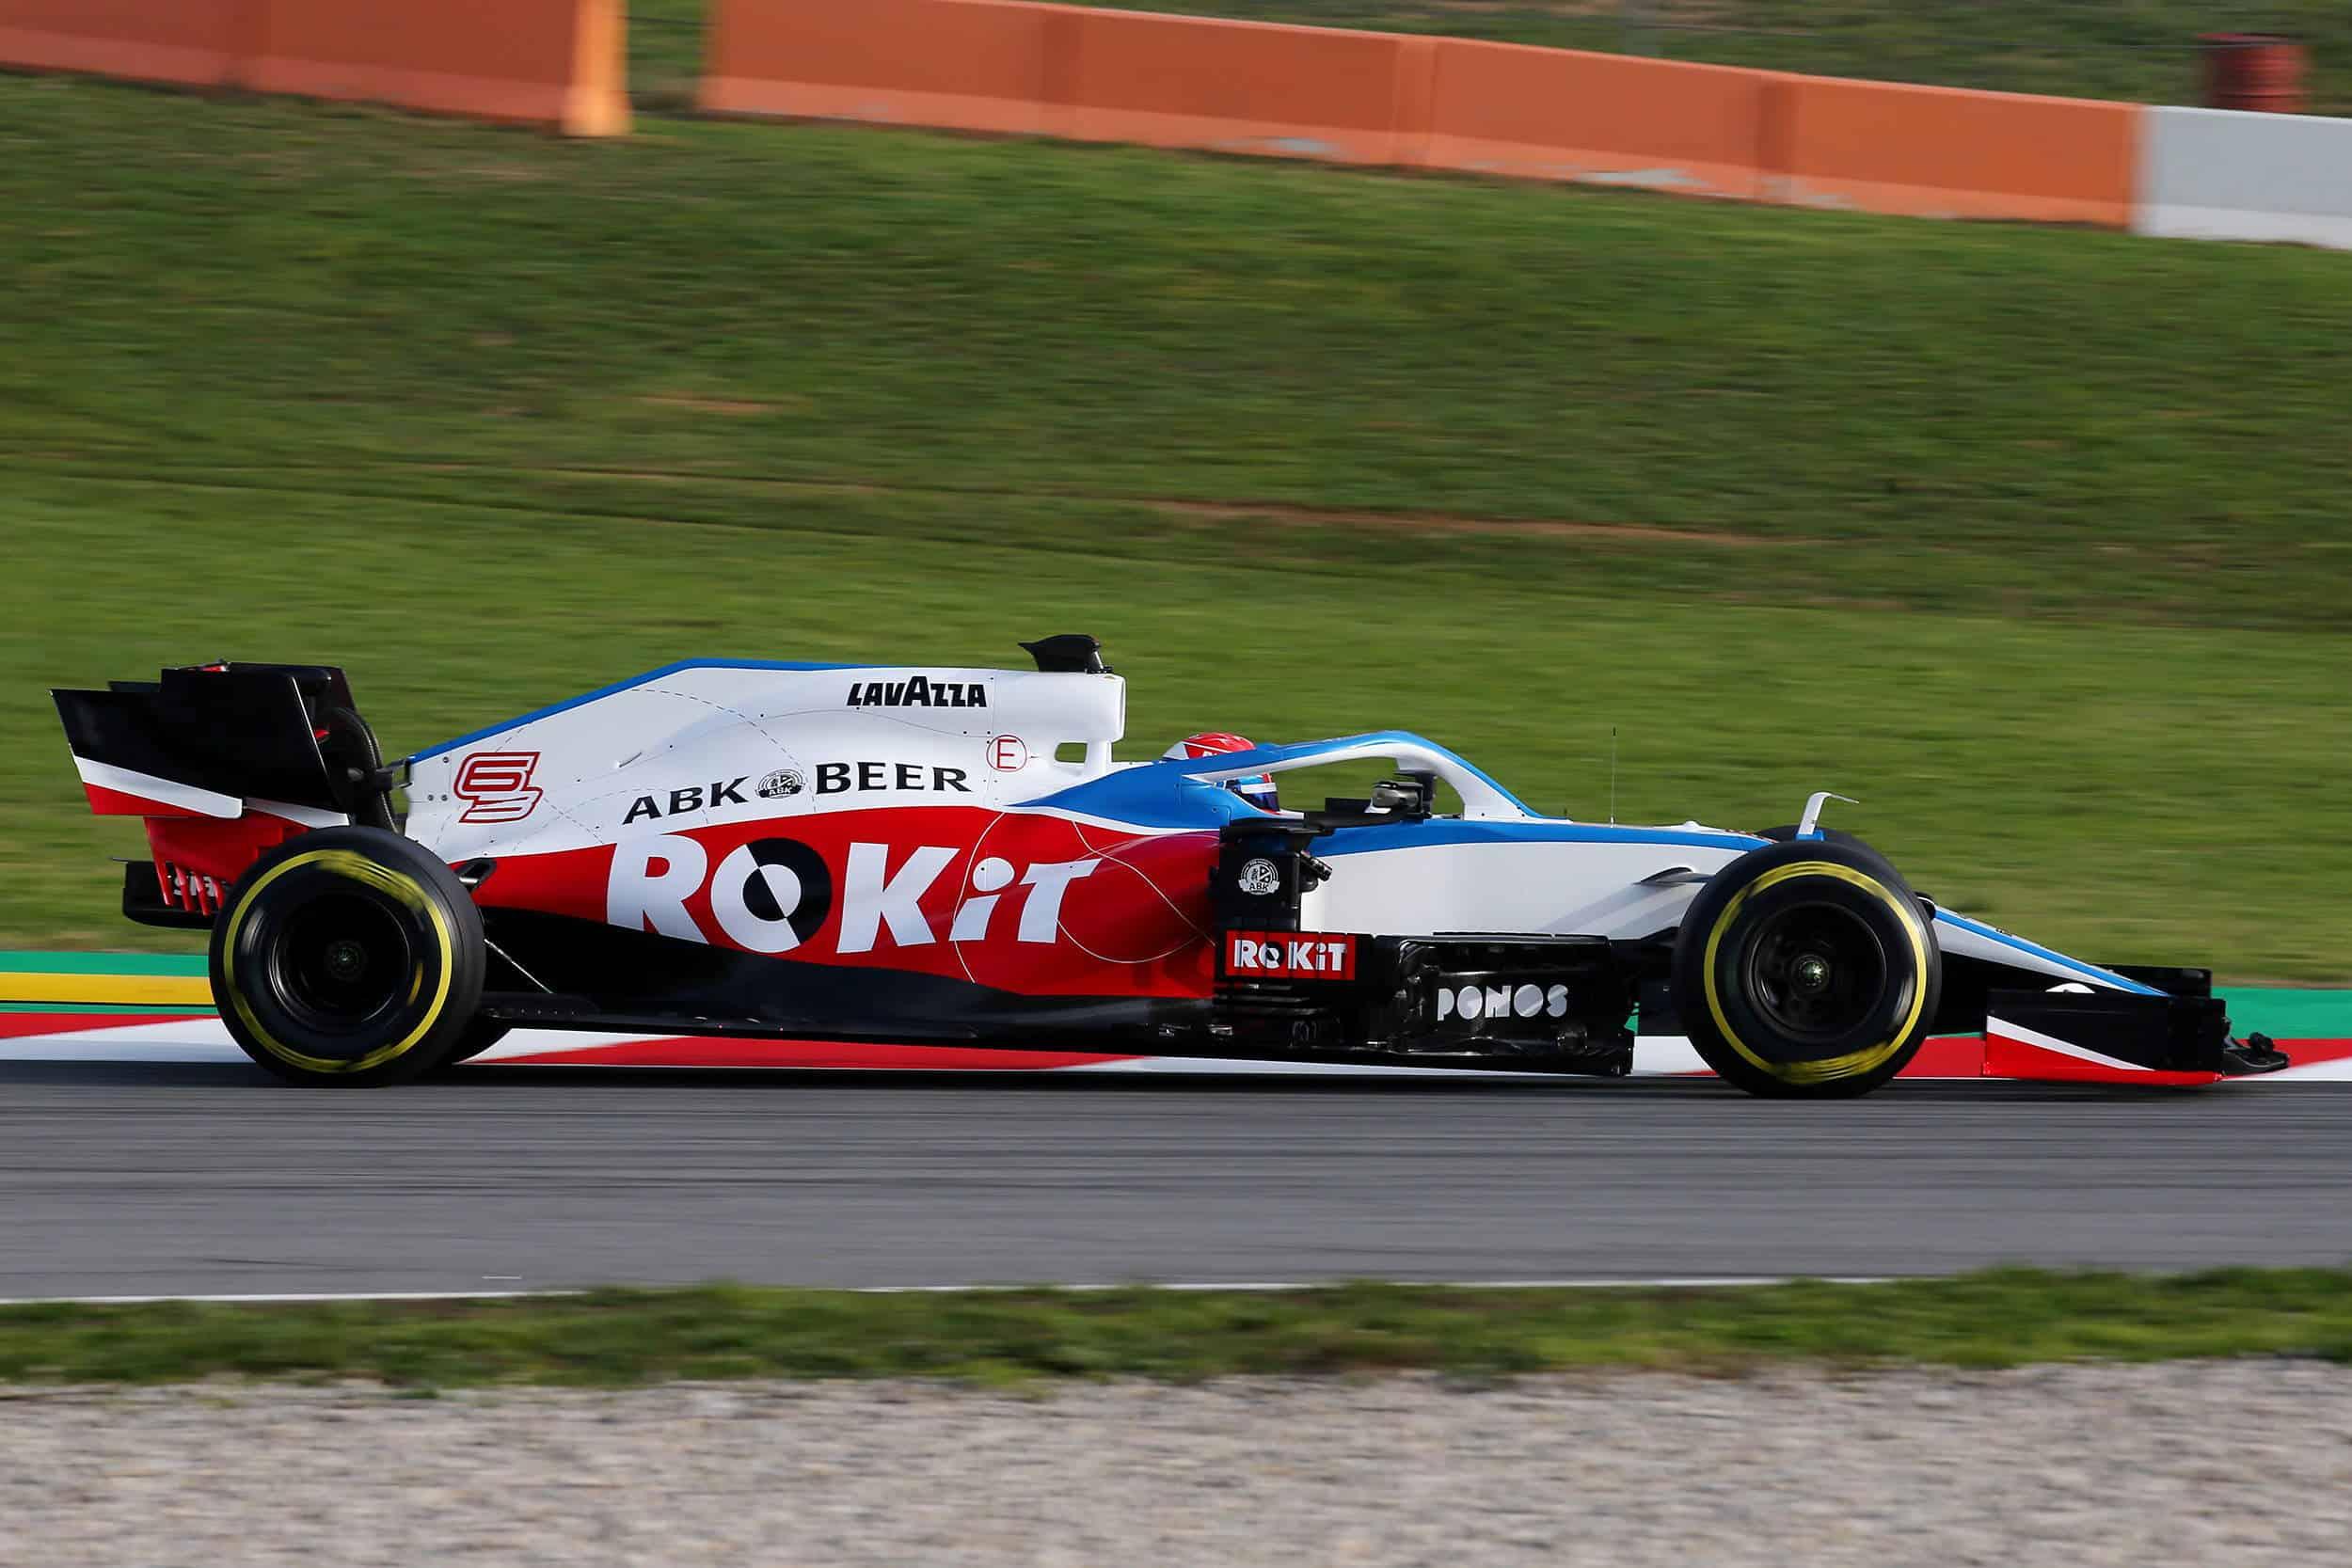 Williams FW43 F1 2020 car on track 2 Photo Williams